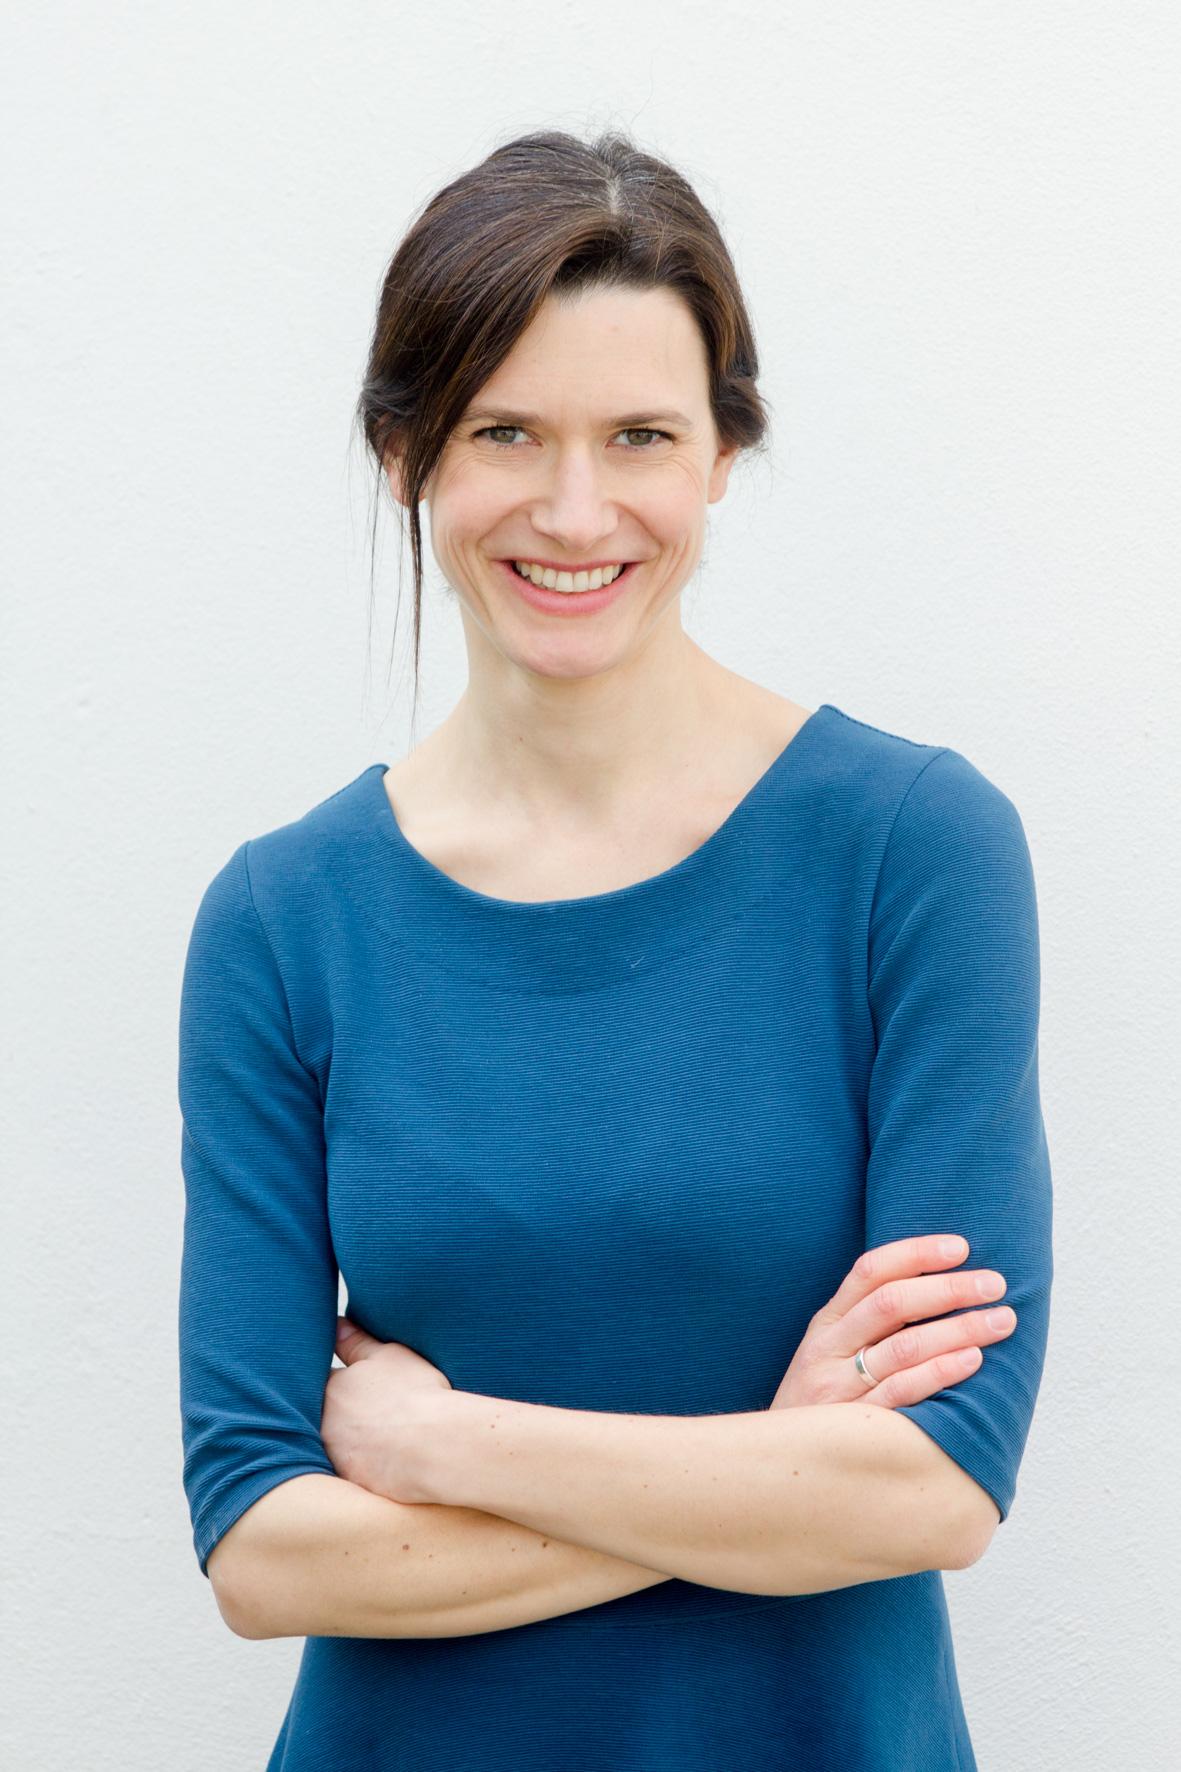 BAZ - Interview Psychologin Frau Kiefer